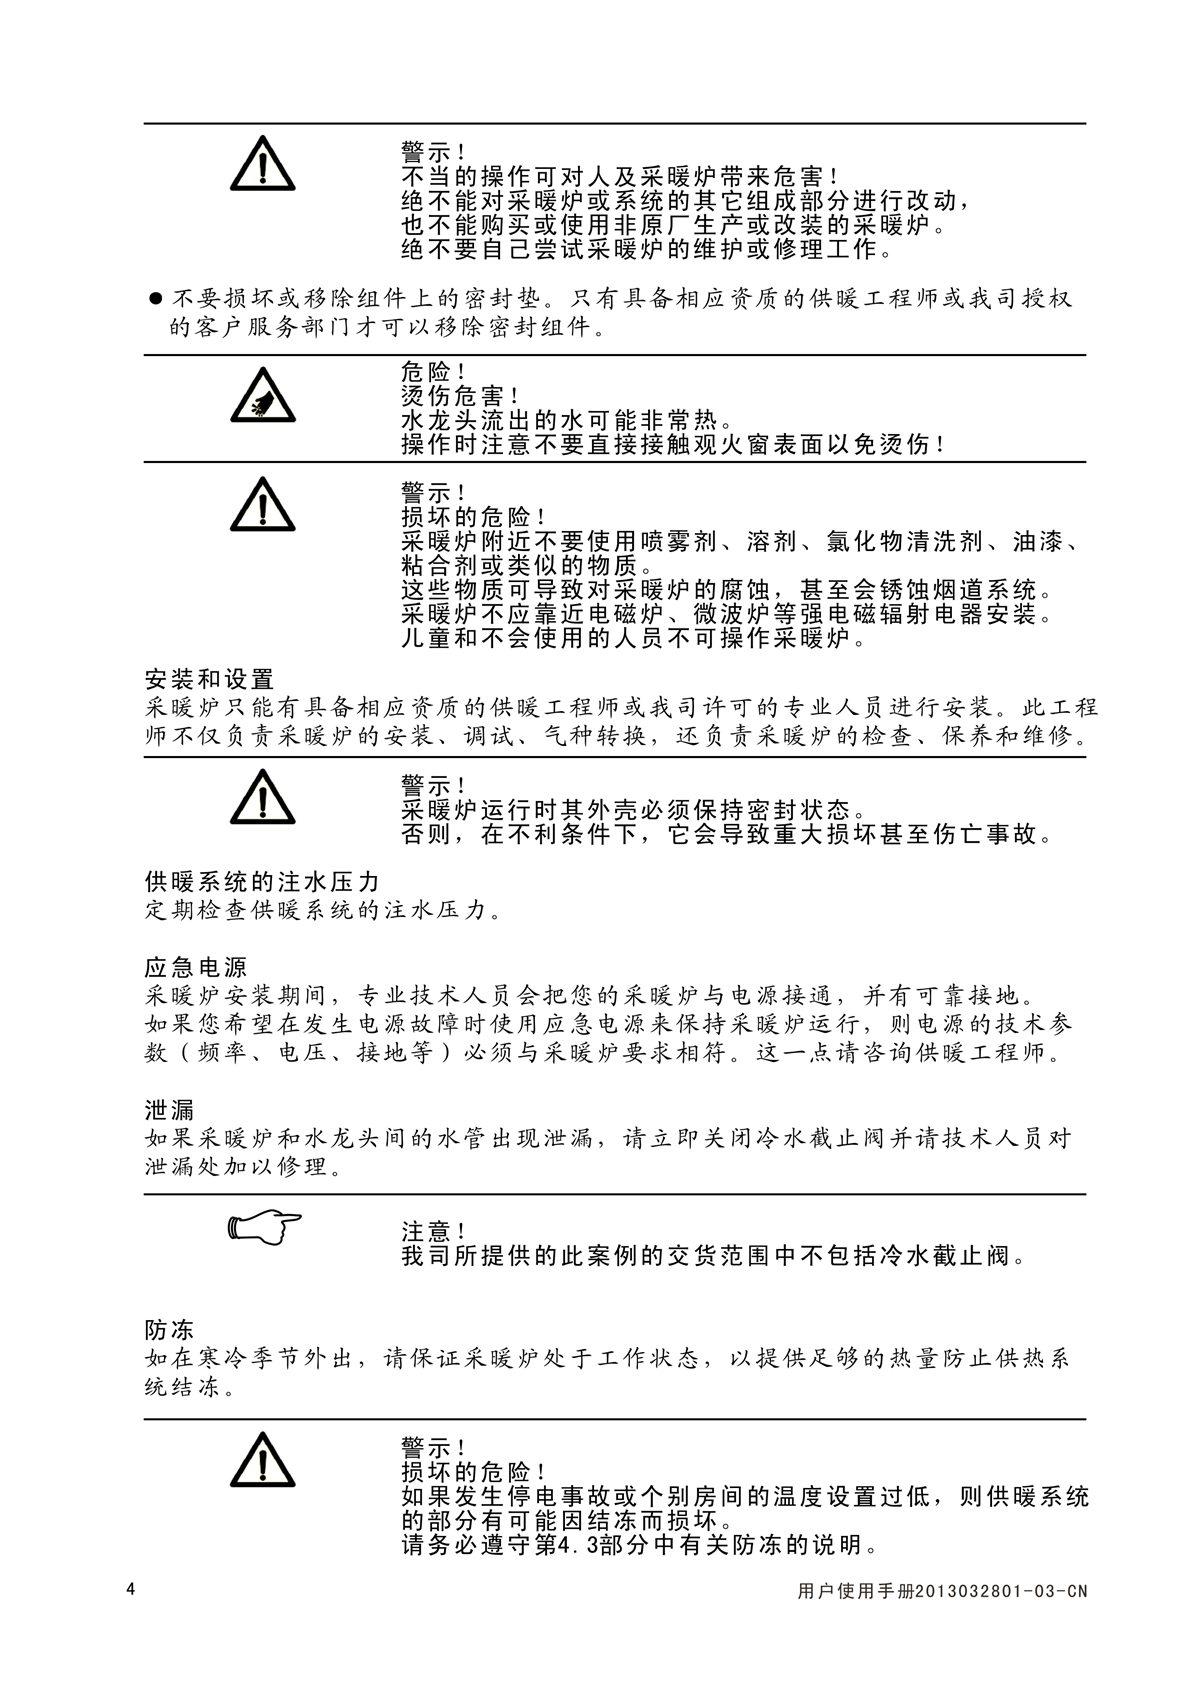 ES03系列-用户使用手册-5_01.jpg